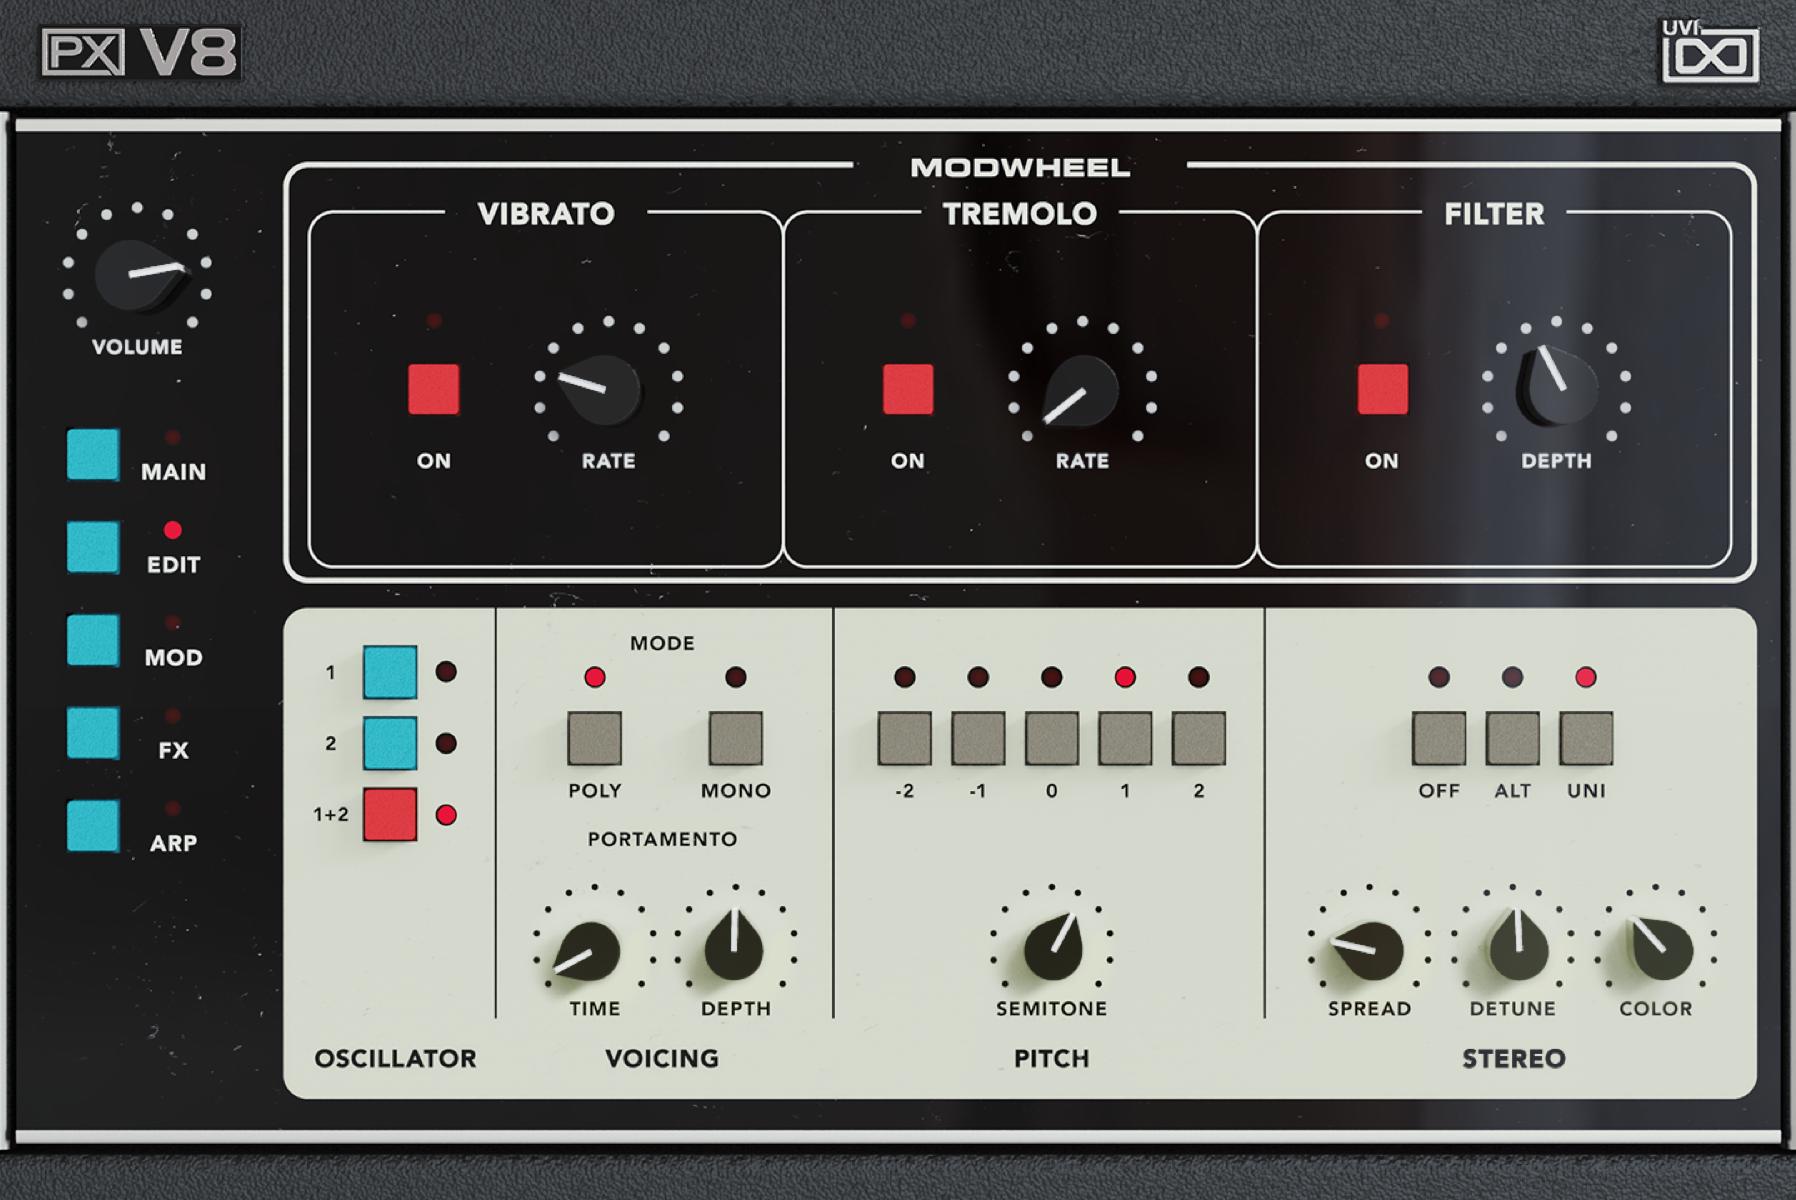 UVI PX V8 | GUI Edit